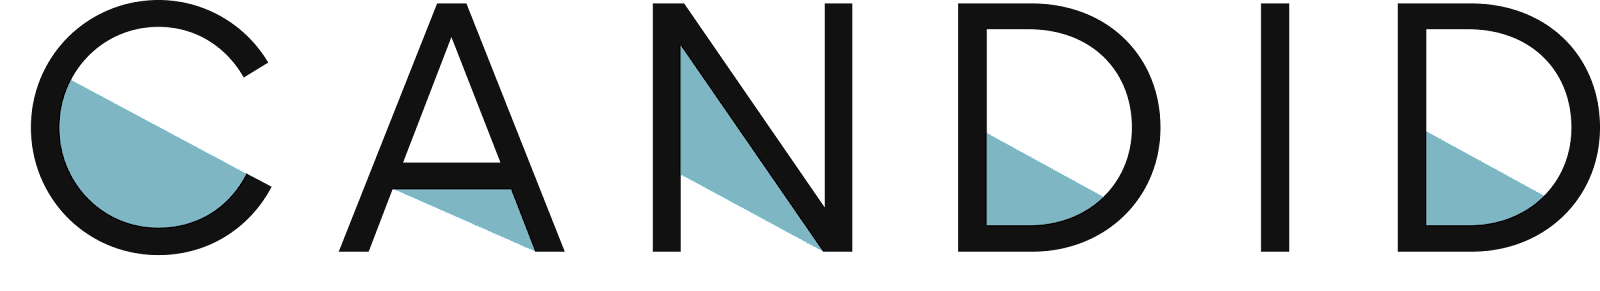 Candid's logo